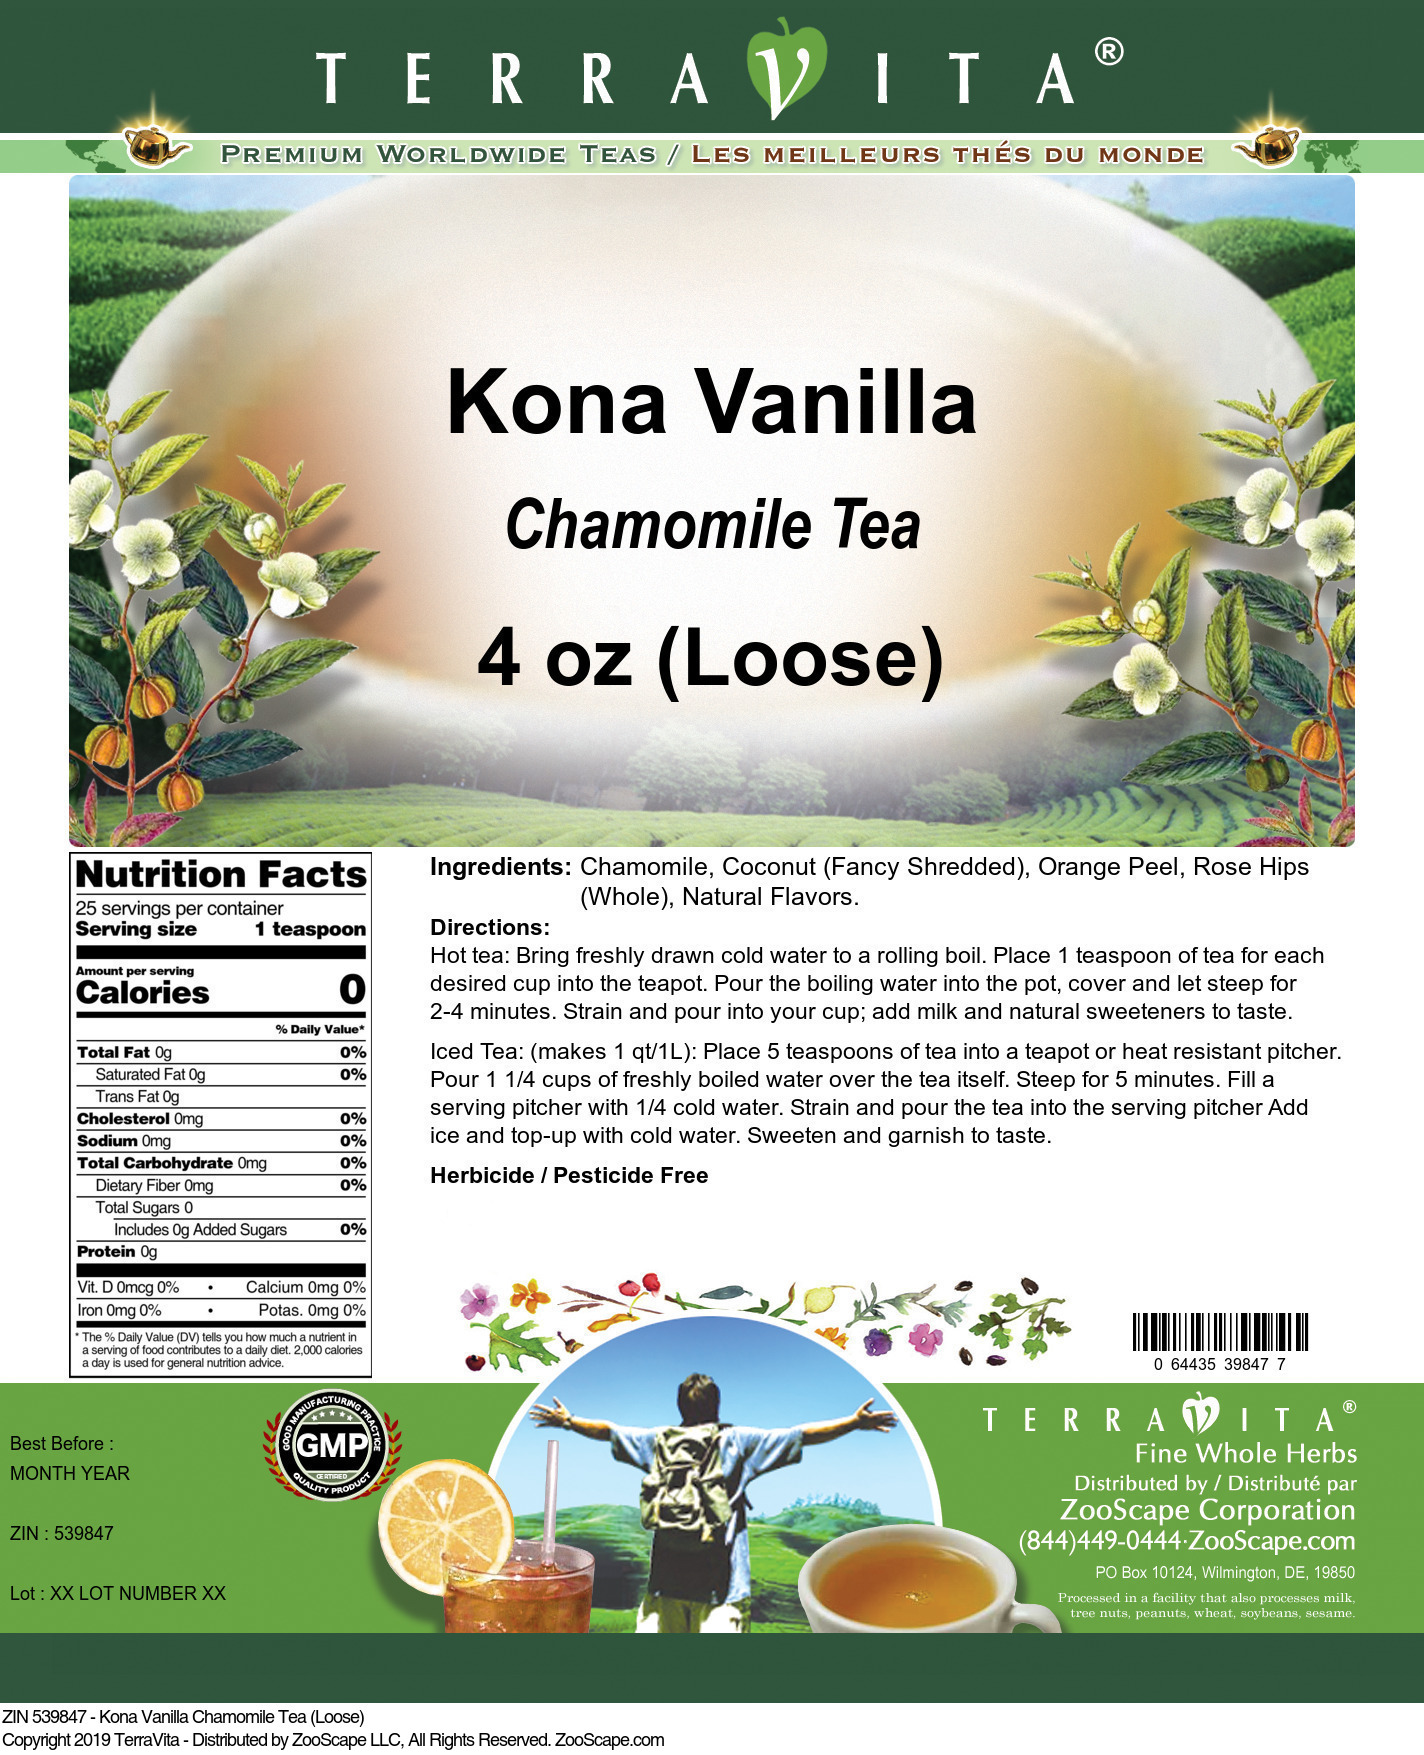 Kona Vanilla Chamomile Tea (Loose)